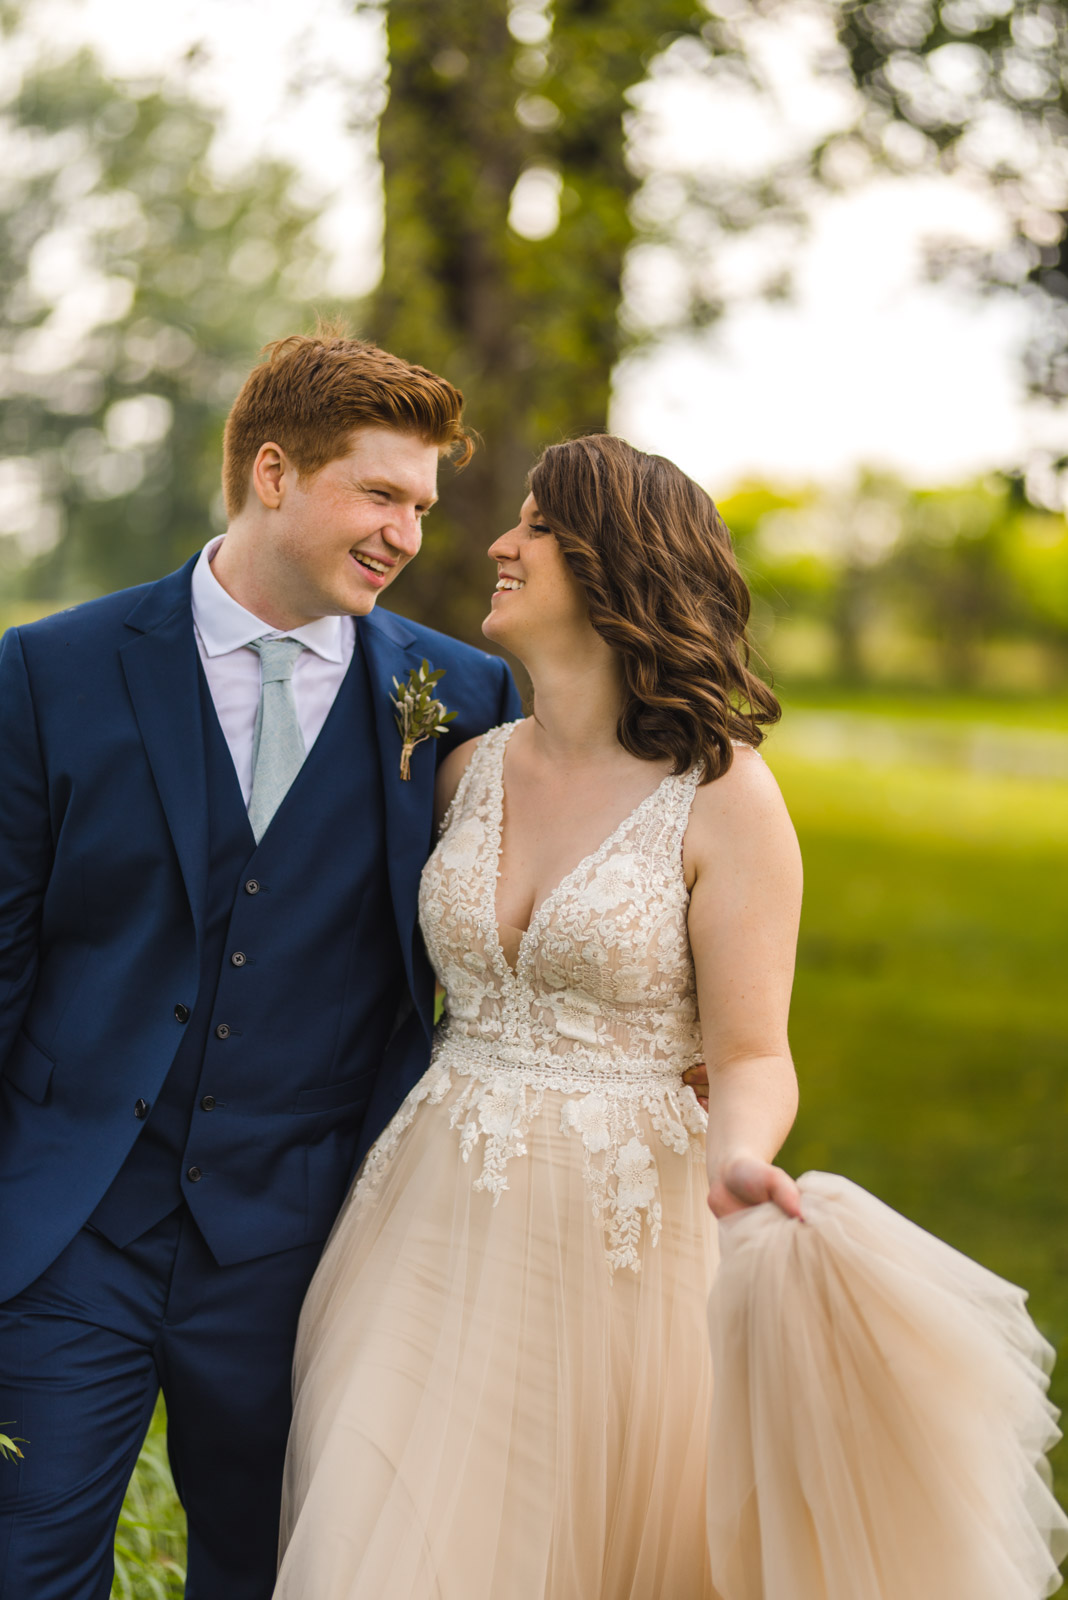 Emerson & Elicia's Golf Course Wedding Aidan & Leanne Hennebry Hamilton Wedding Videographers Photographers Niagara Hush Hush Photography & Film-50.jpg